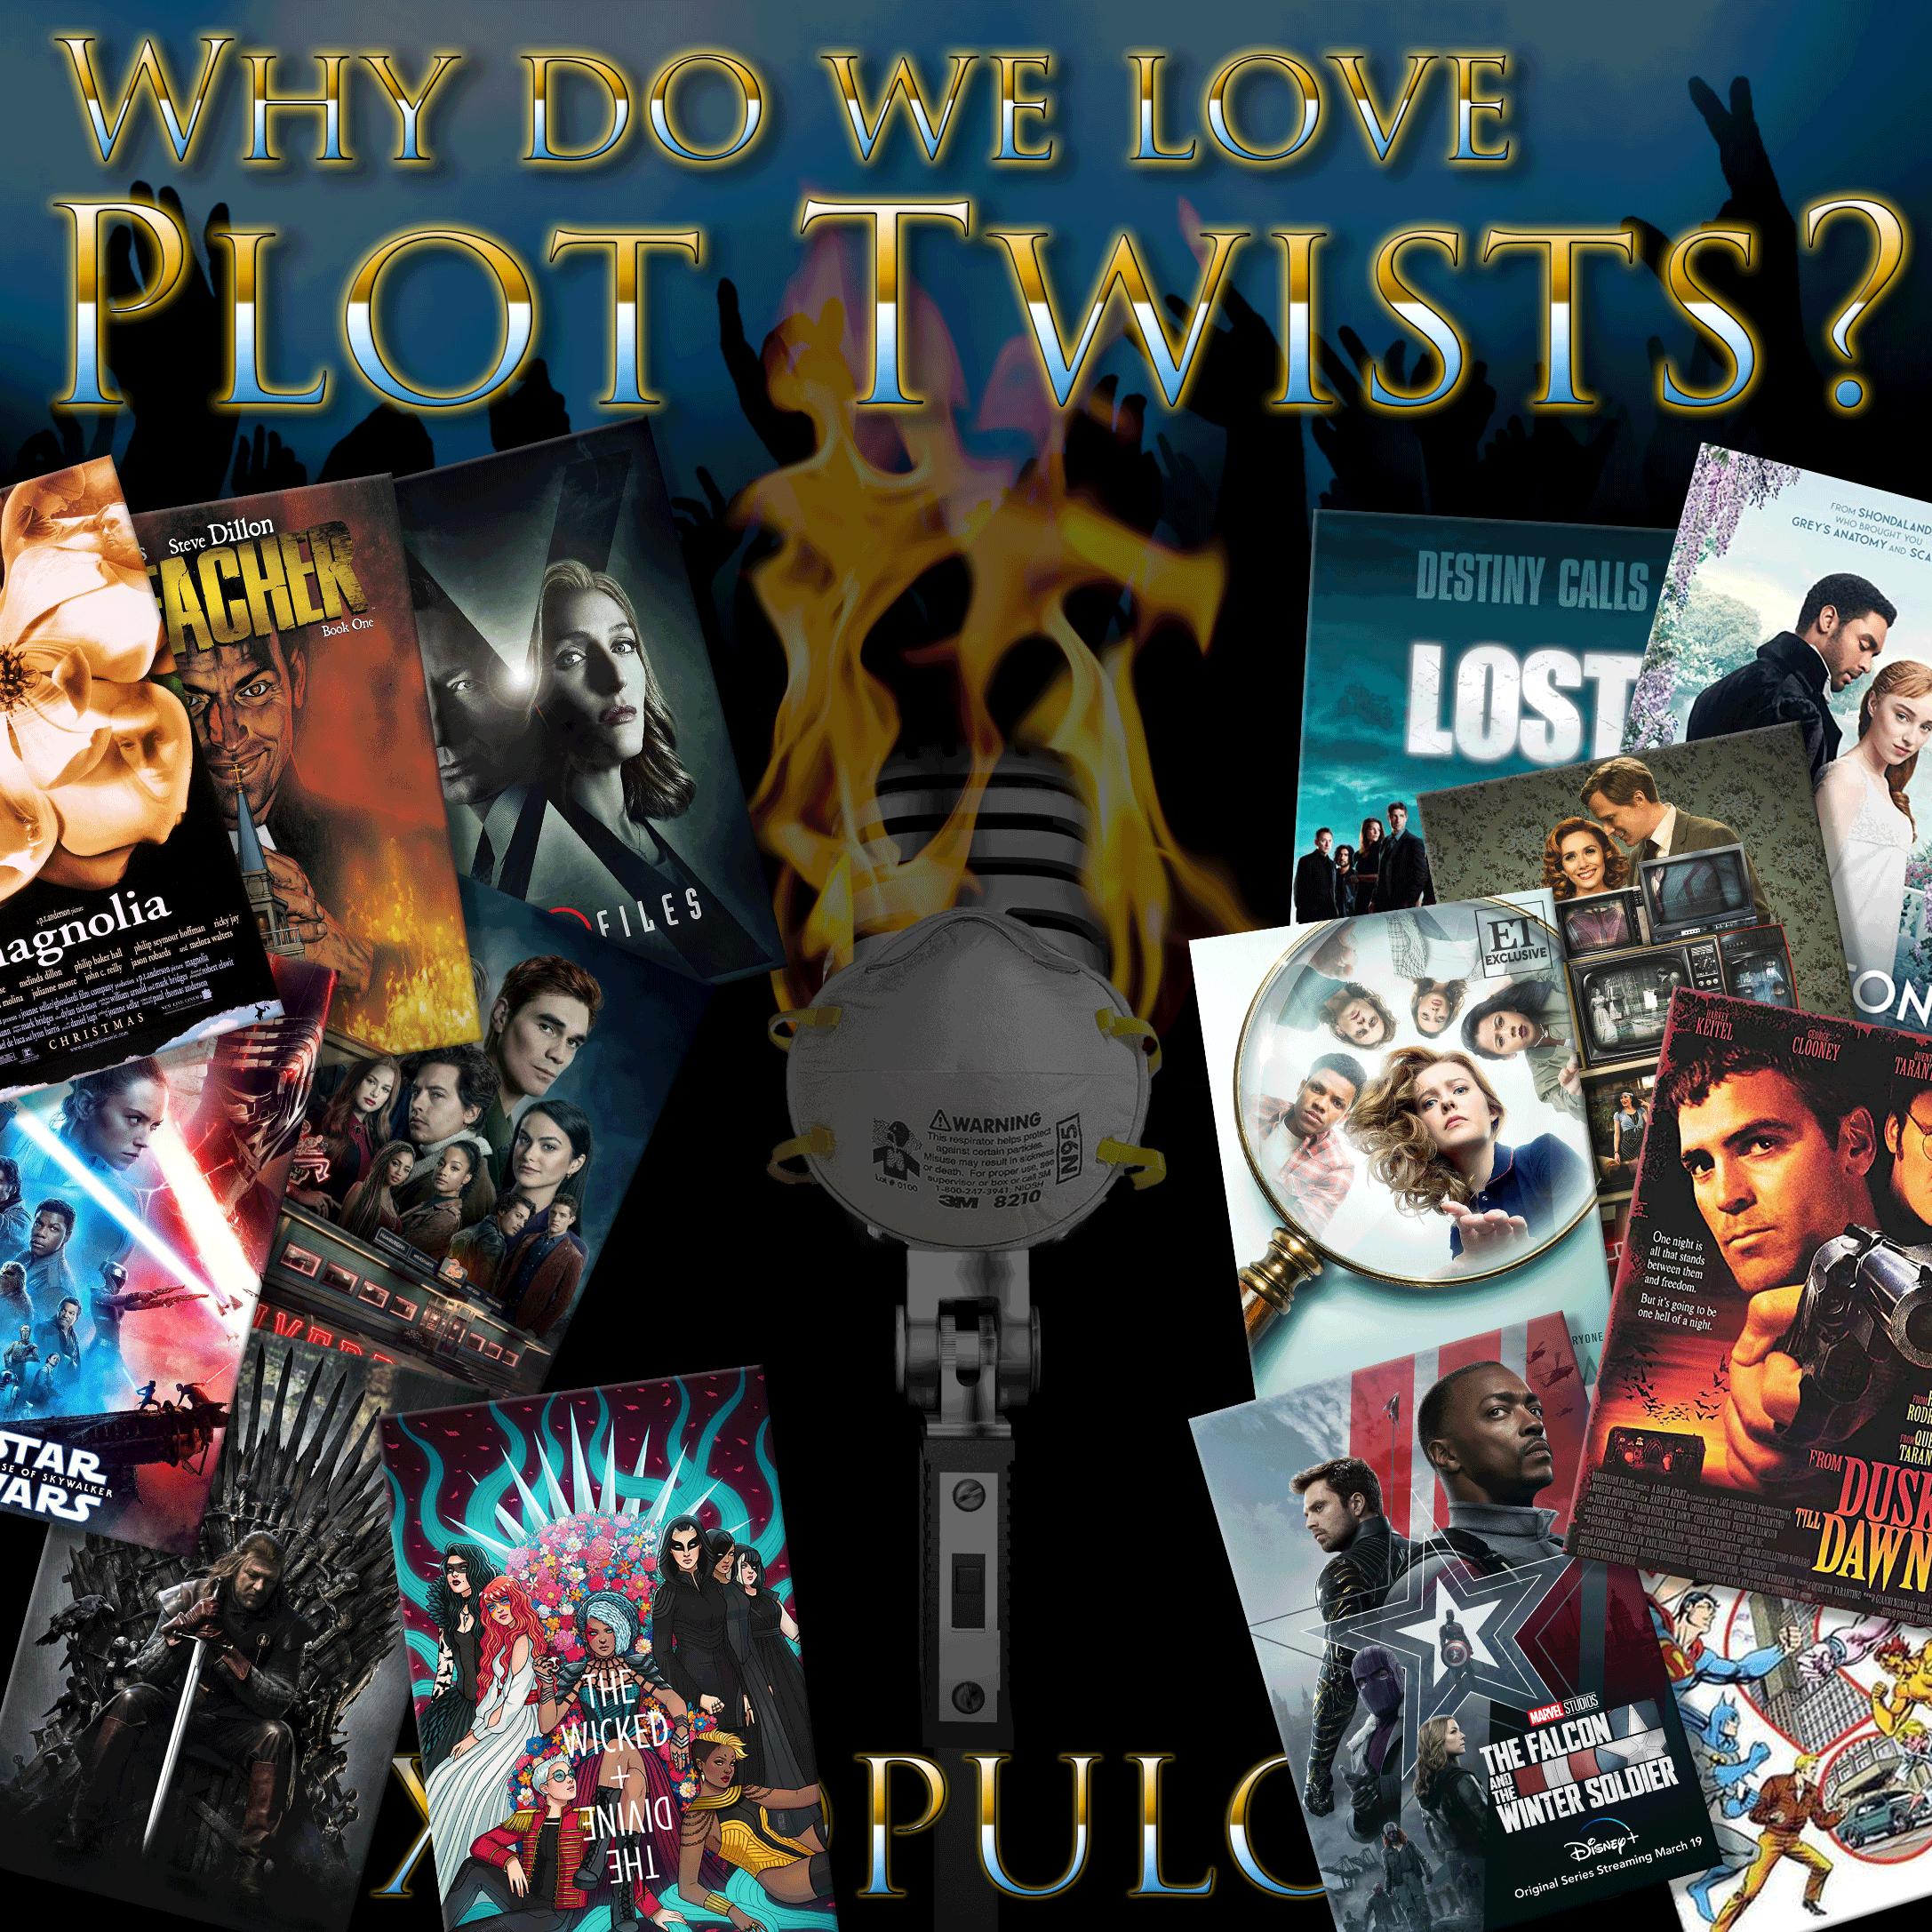 e164. Why Do We Love Plot Twists?